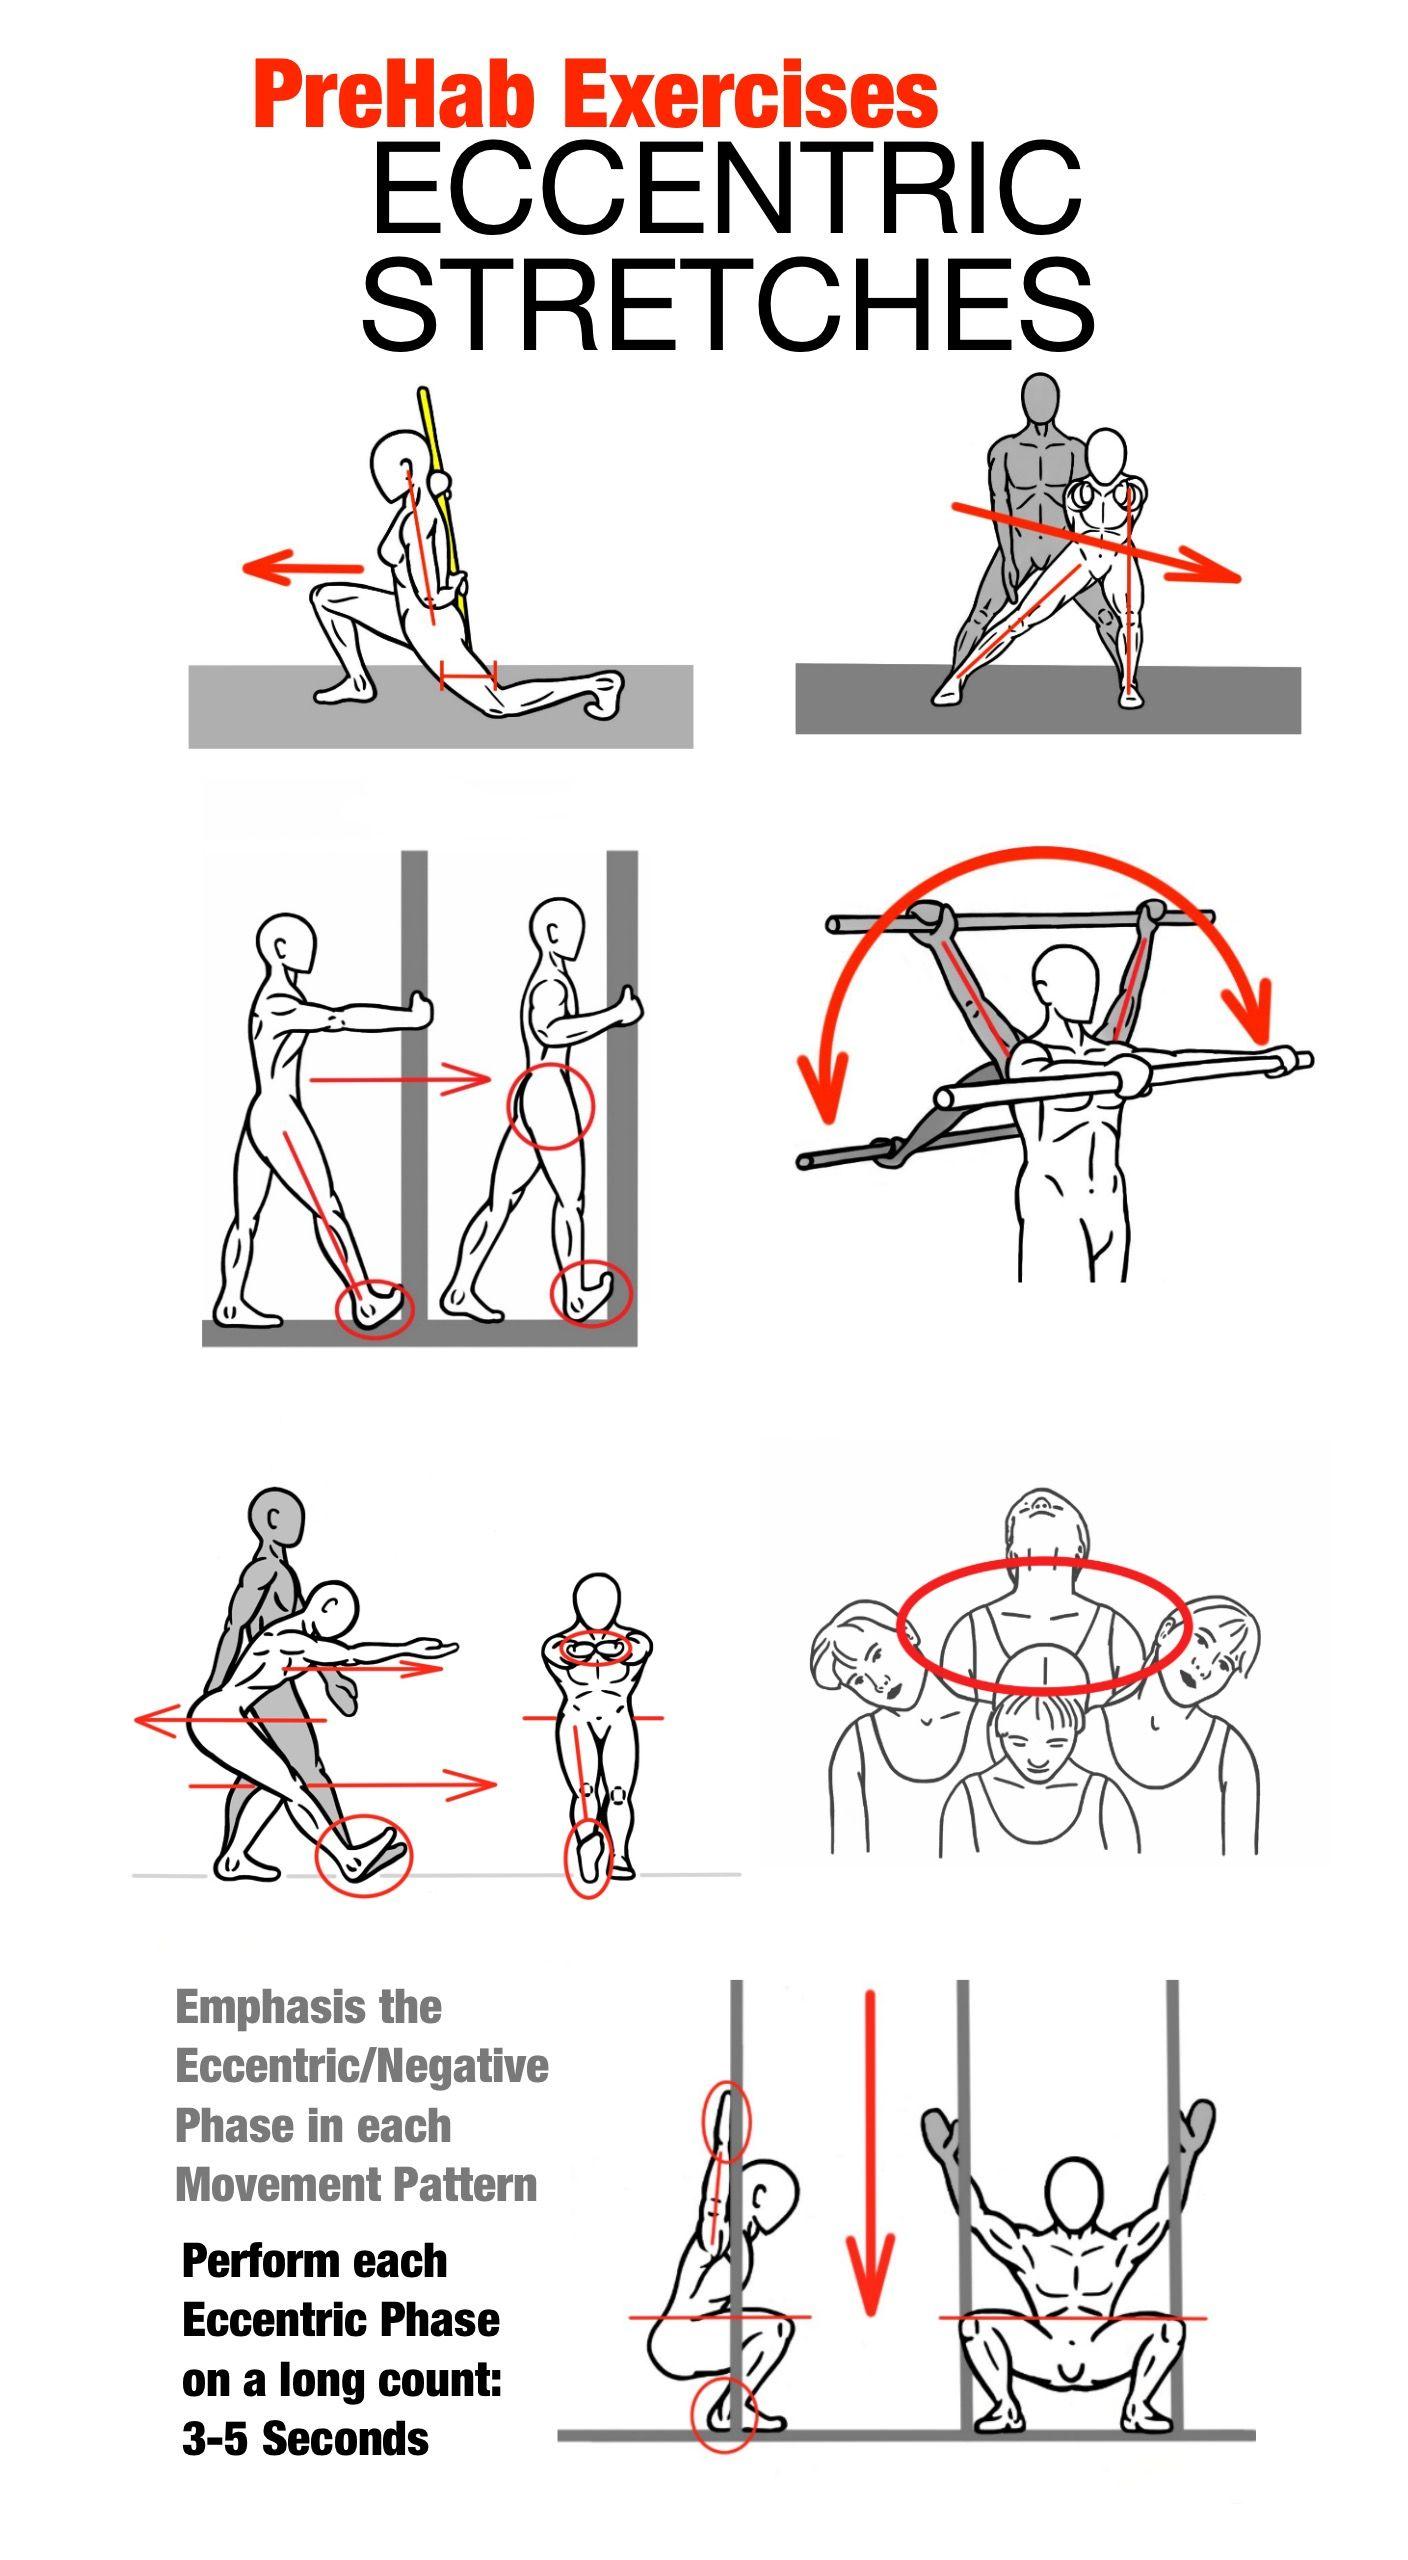 eccentric workout